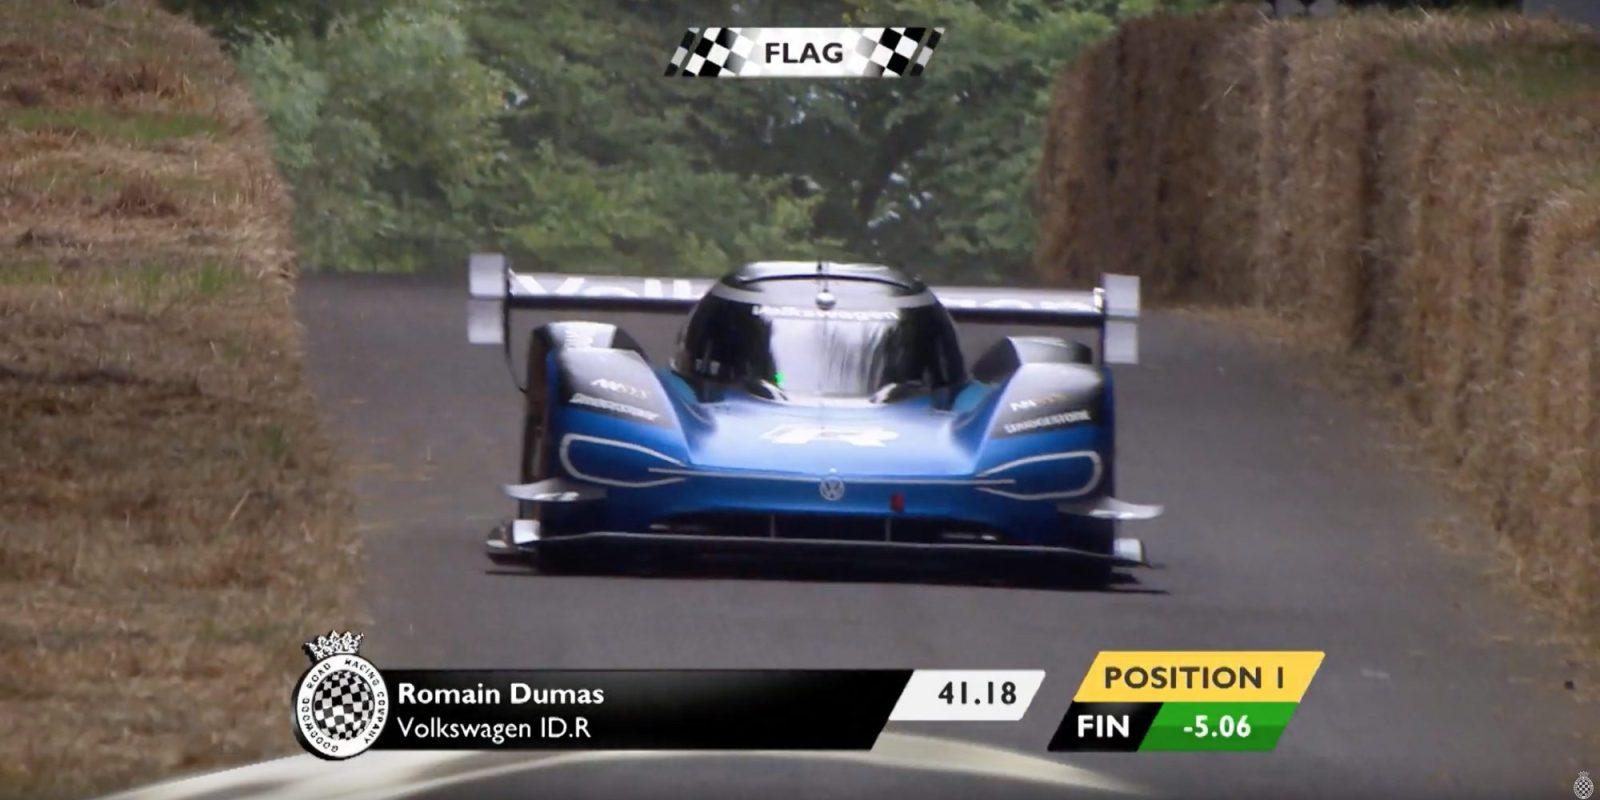 Volkswagen ID R breaks 20-year-old Goodwood hillclimb record